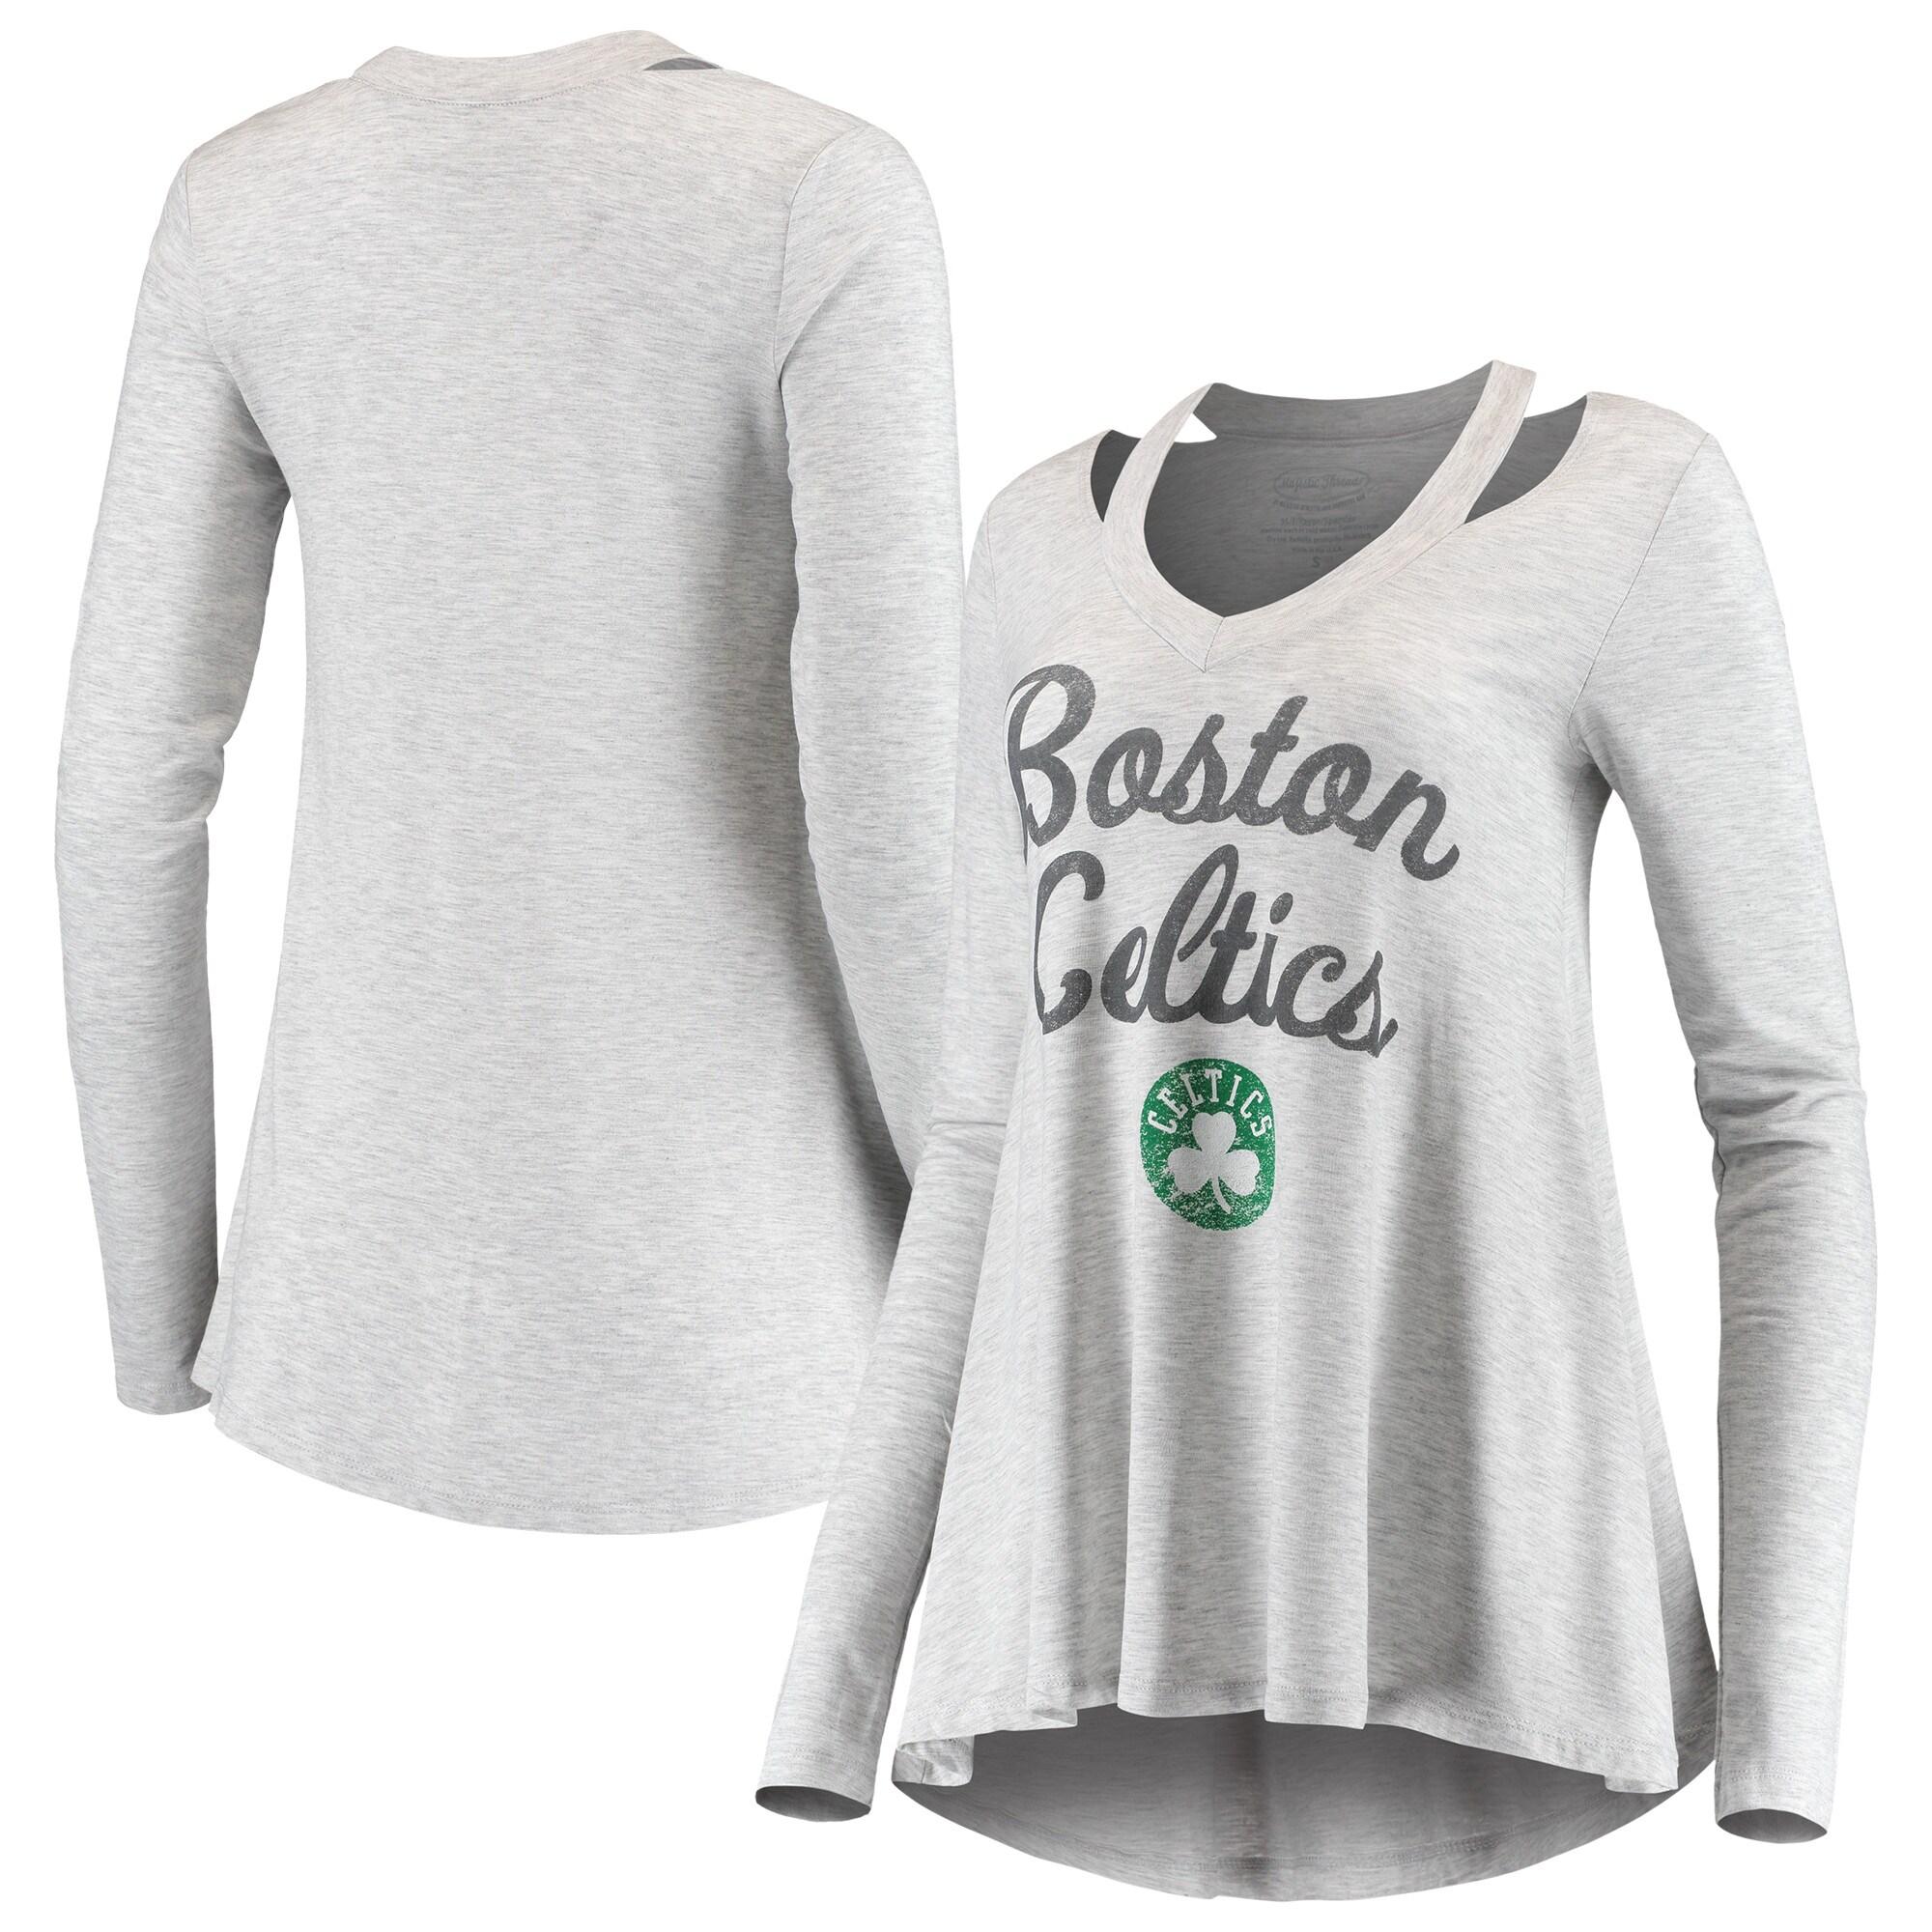 Boston Celtics Majestic Threads Women's Double Dribble Separation Long Sleeve V-Neck T-Shirt - Gray